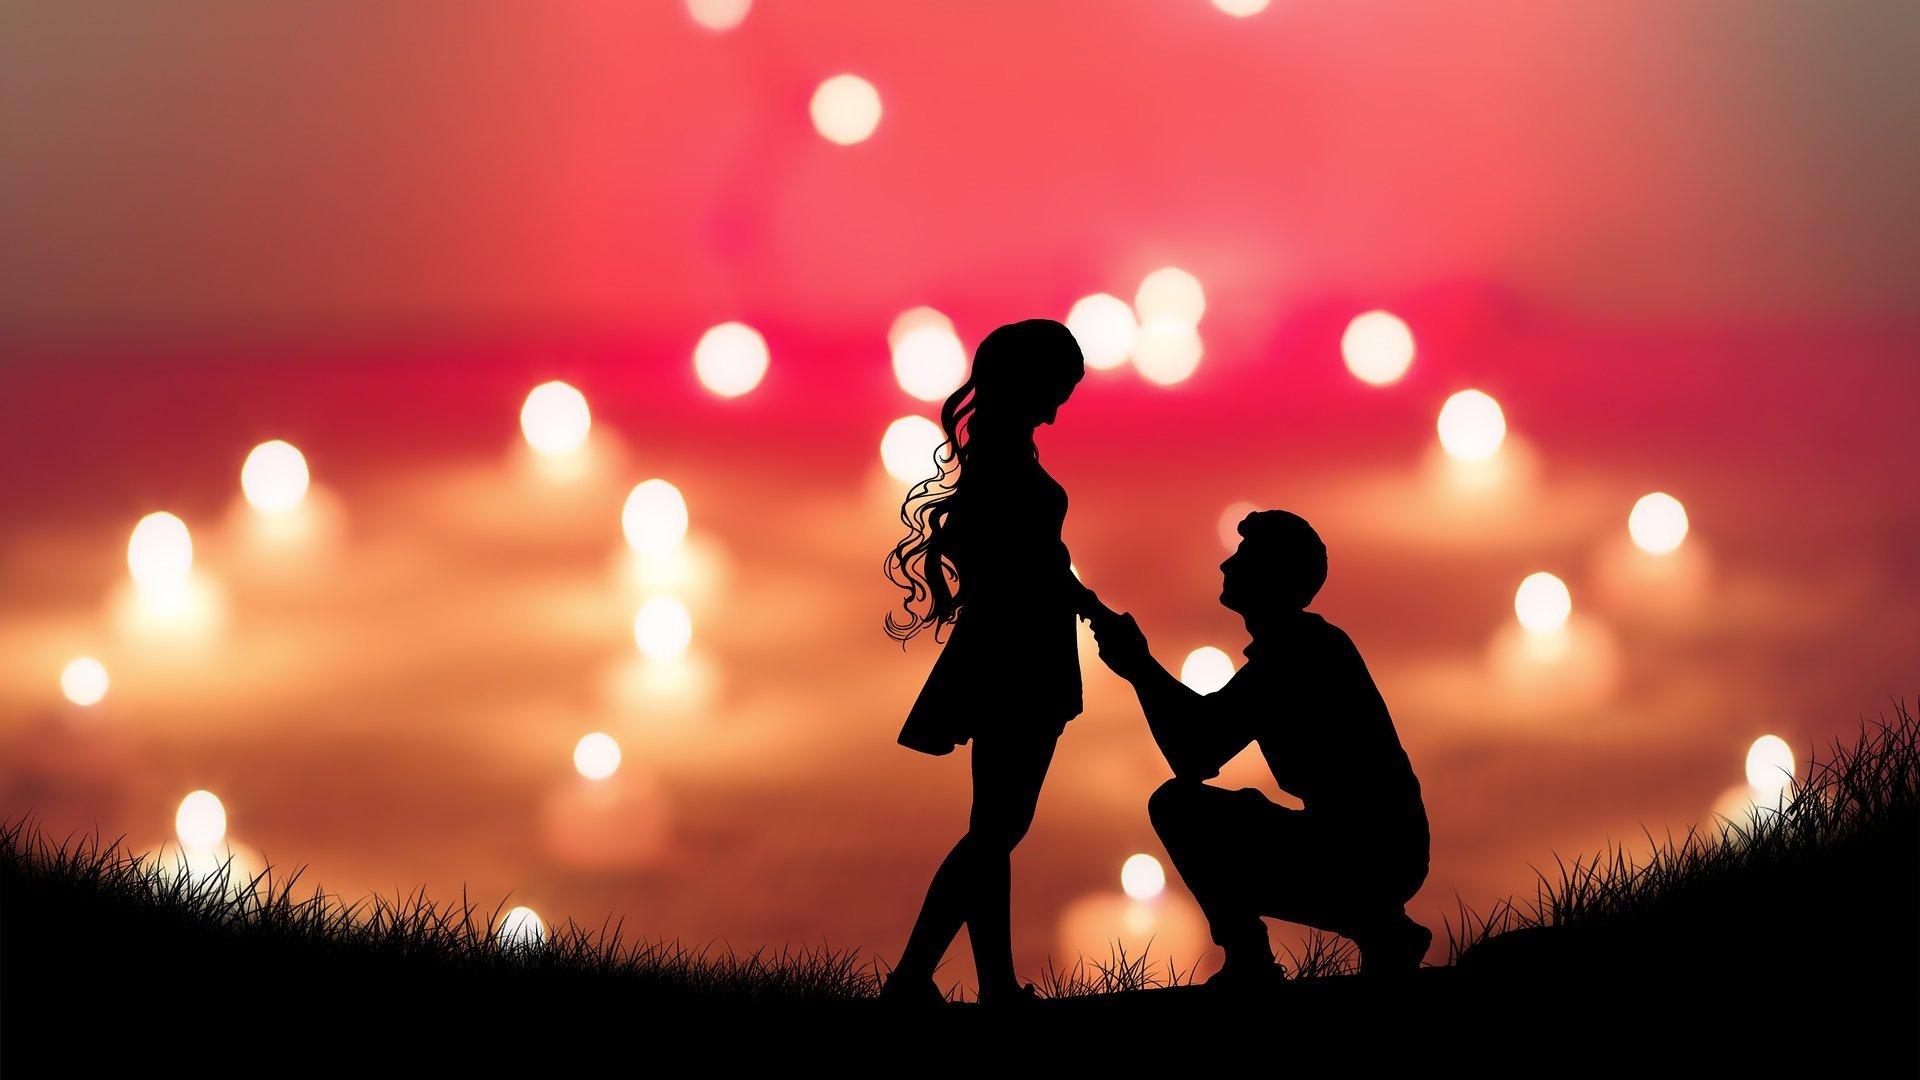 18 Romantic Love Wallpapers Wallpaperboat